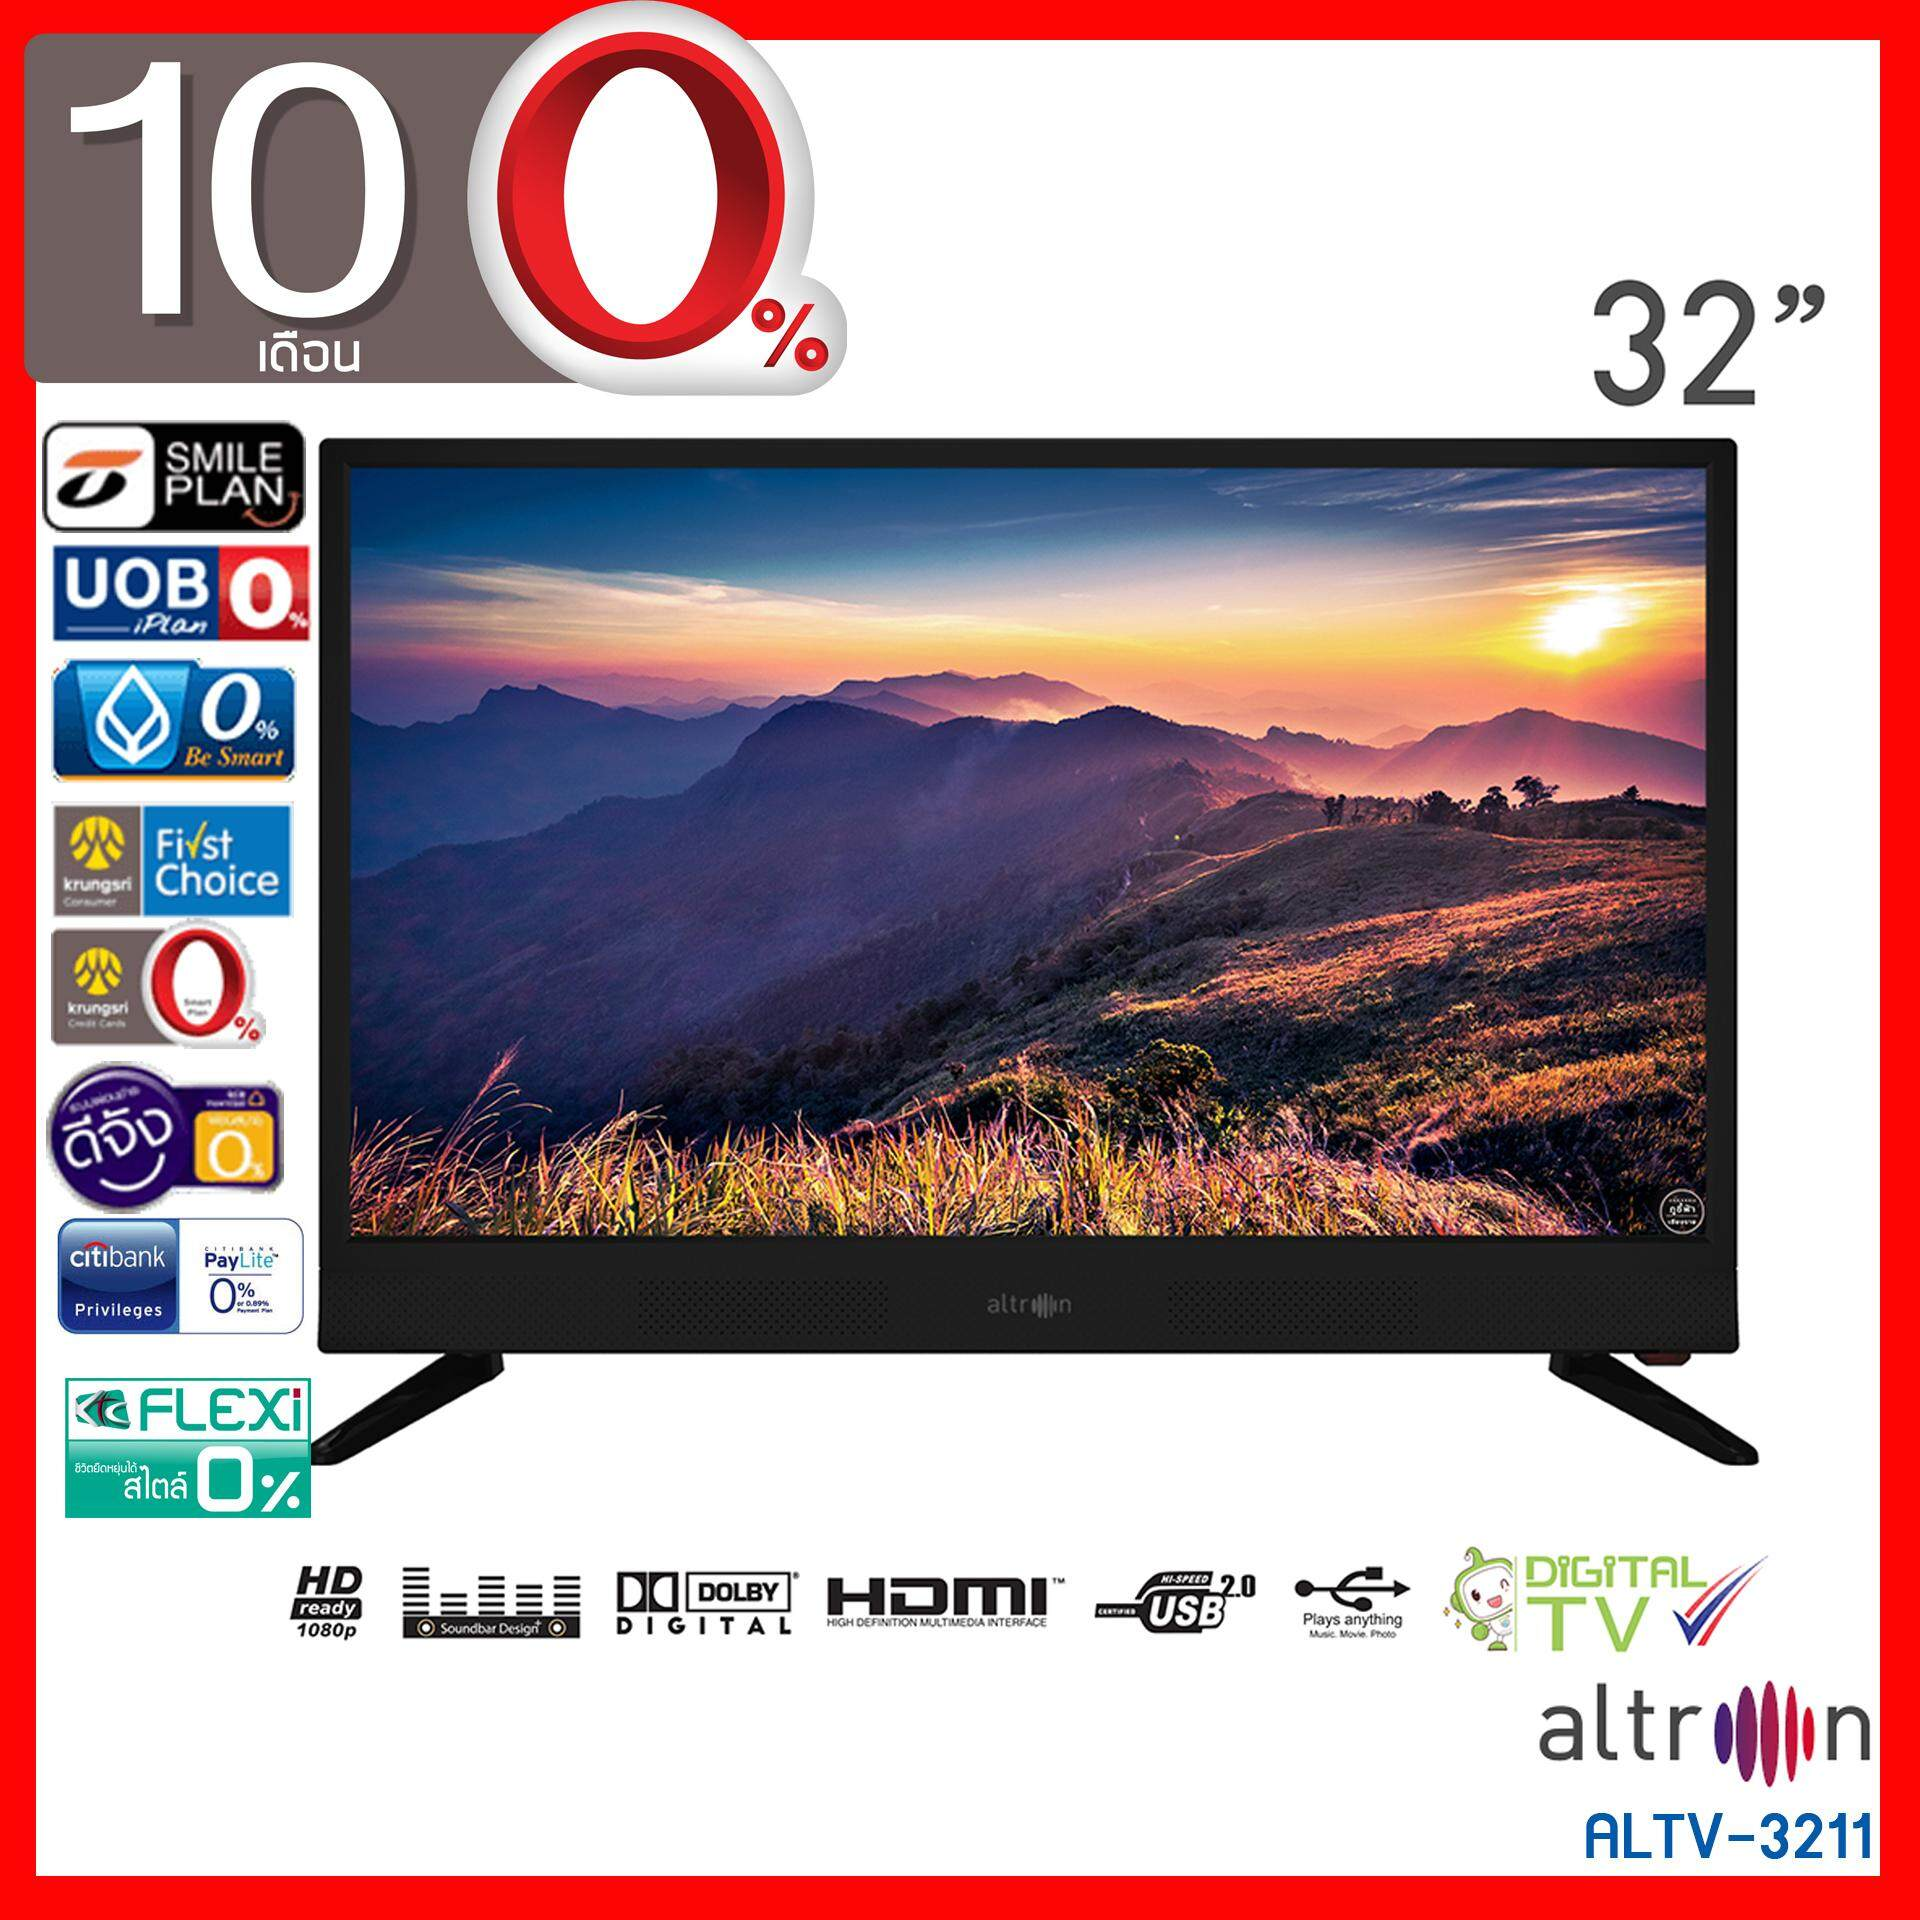 Altron ดิจิตอลทีวี 32 นิ้ว รุ่น LTV-3211 (ผ่อน 0% 6 เดือน)